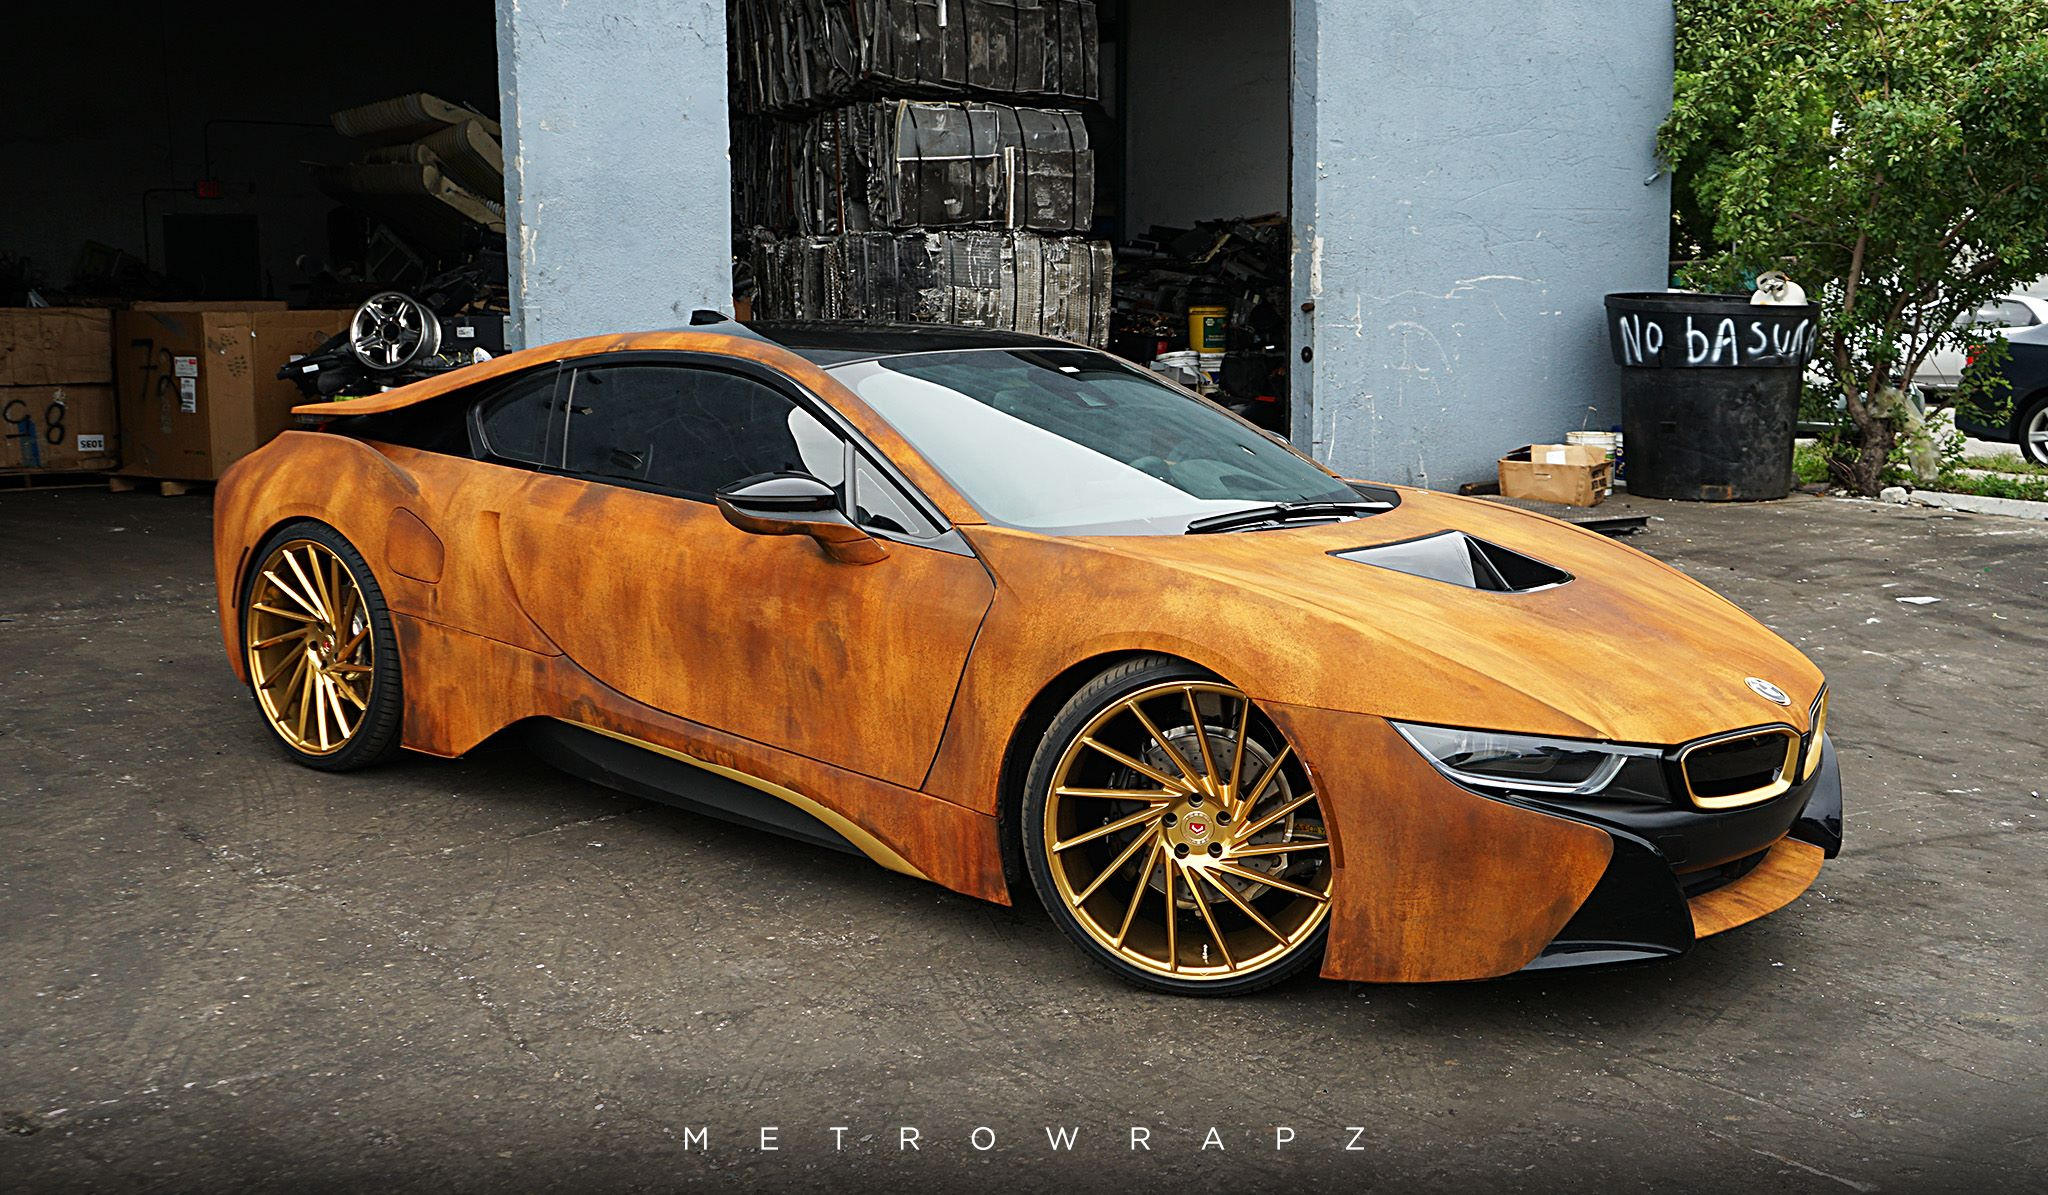 Austin Mahone S Rust Wrap Bmw I8 Looks Amazing Autoevolution